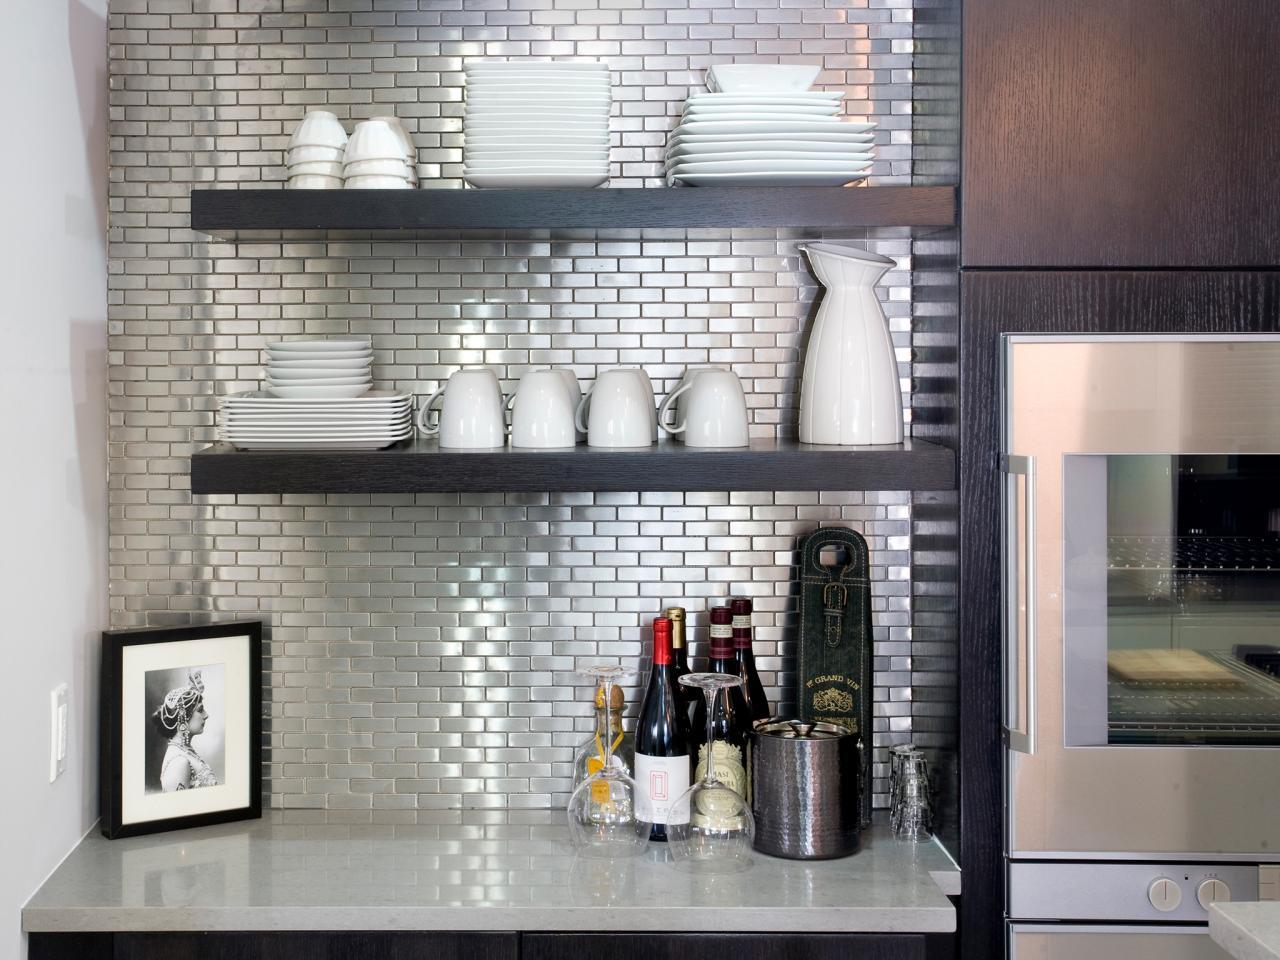 HKITC106_Kitchen-Stainless-Steel-Tile-Backsplashes_s4x3.jpg.rend.hgtvcom.1280.960